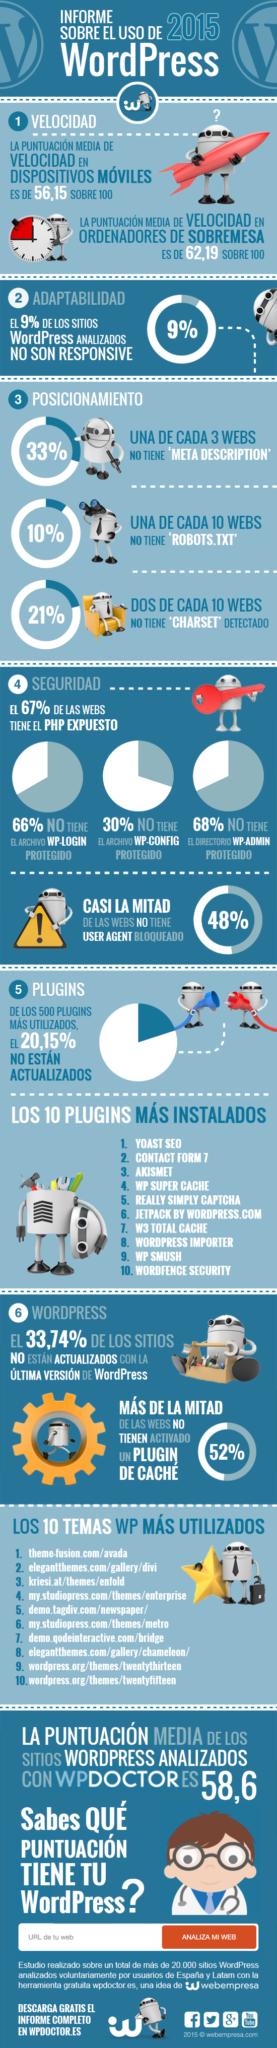 EL-USO-DE-WORDPRESS-2015-Un-estudio-de-Webempresa